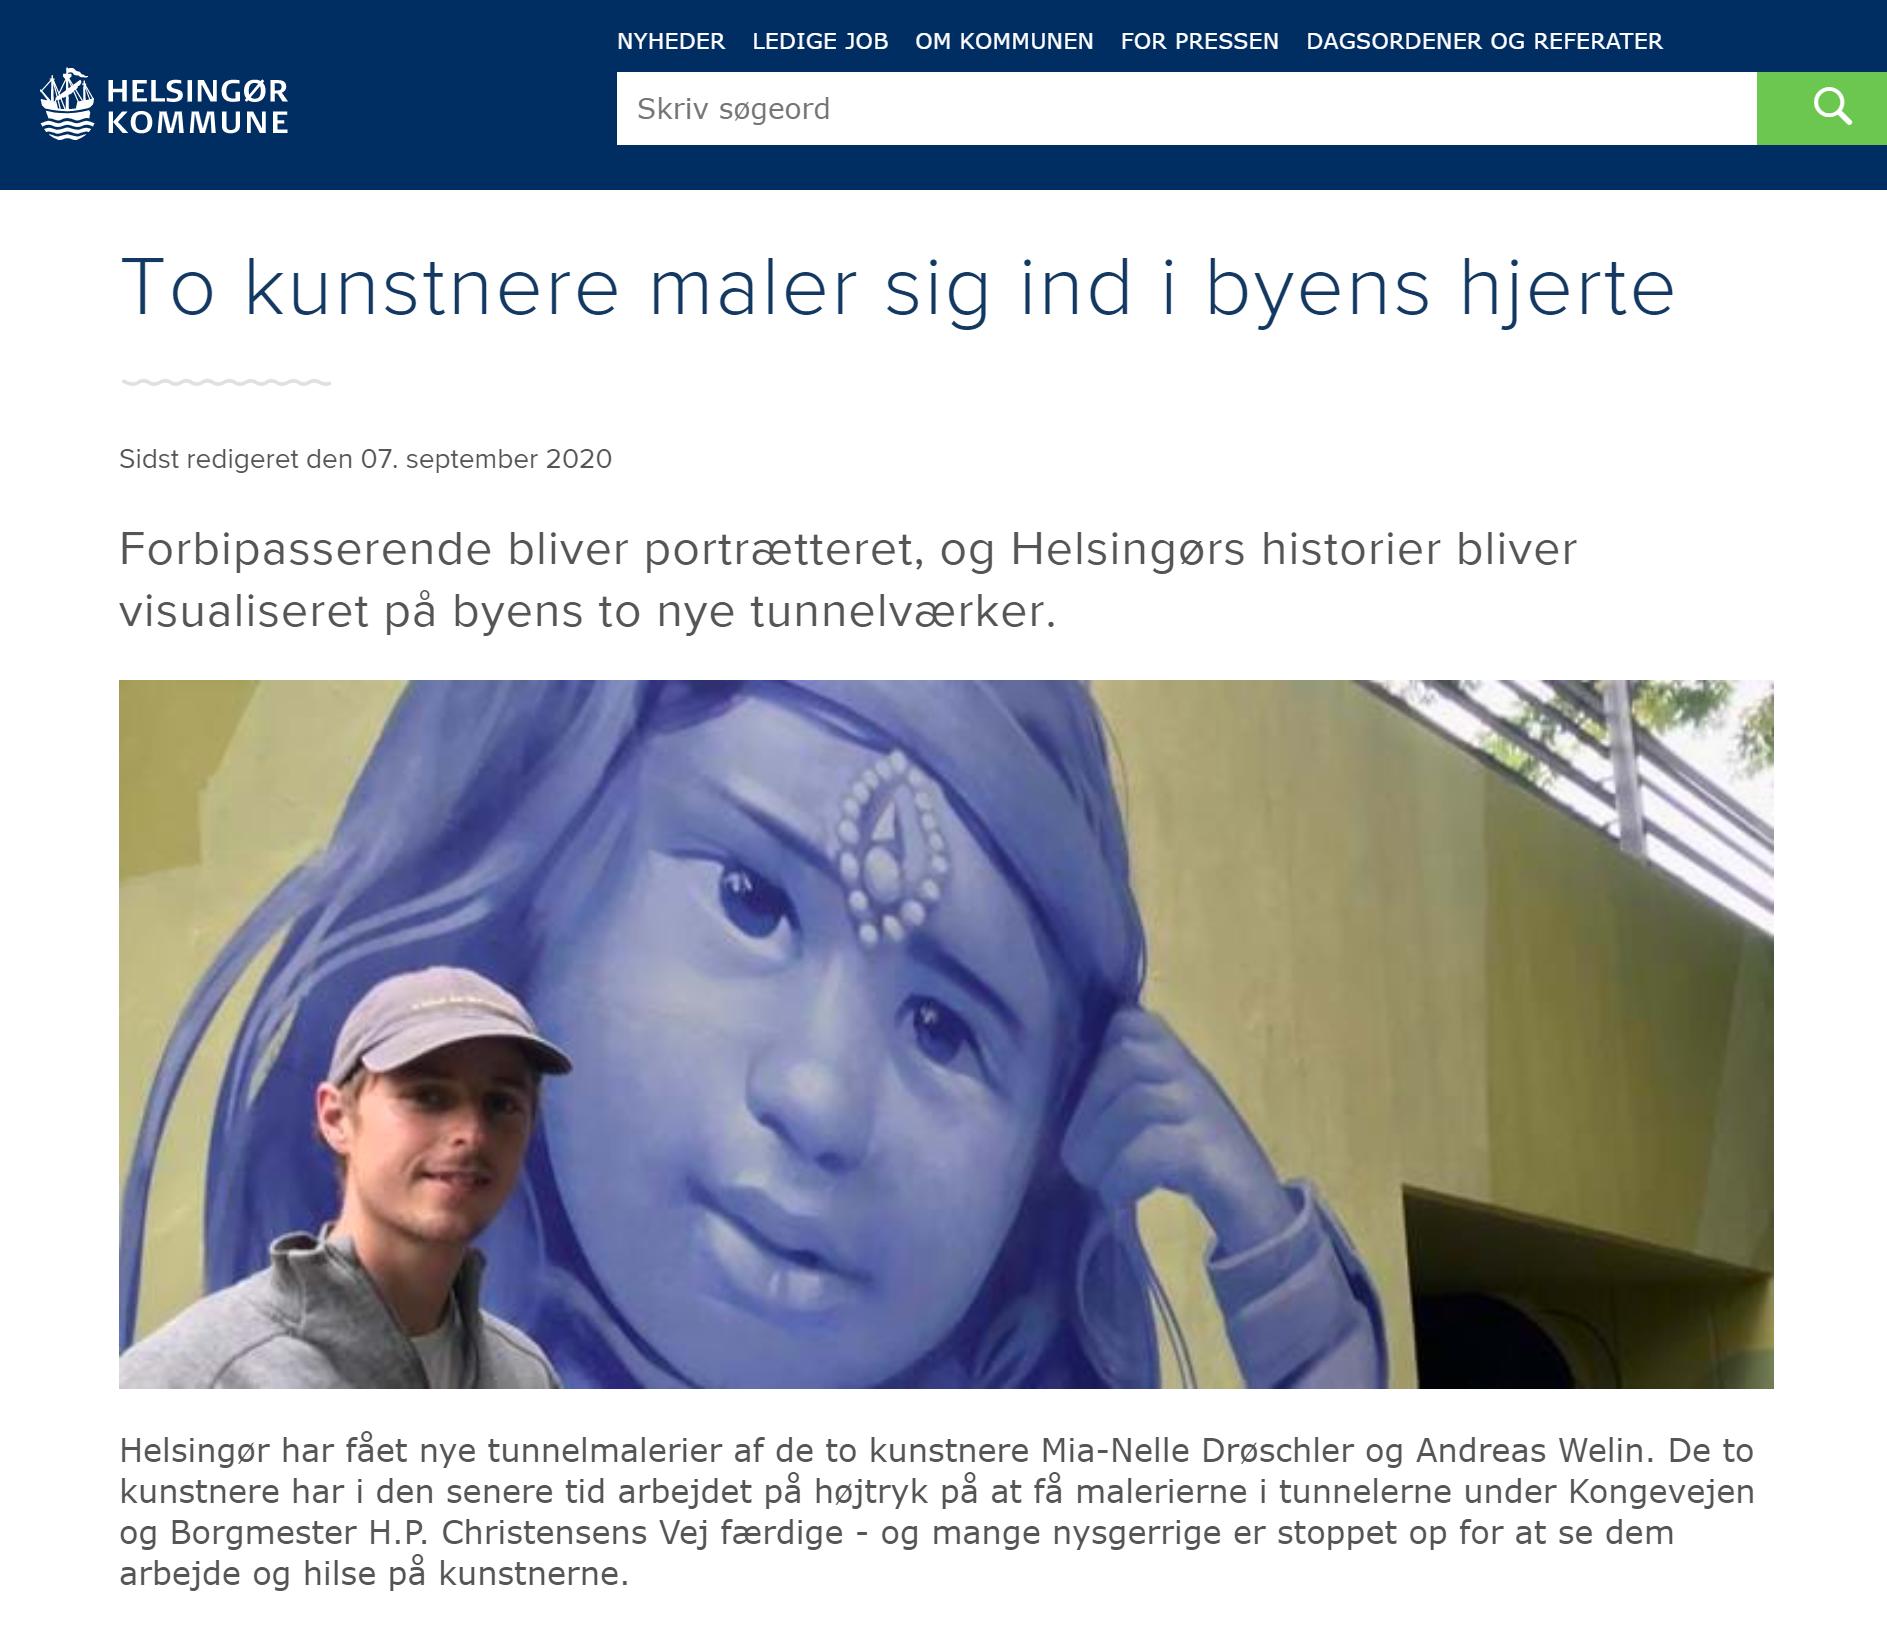 Tunnel artwork Helsingør kommune